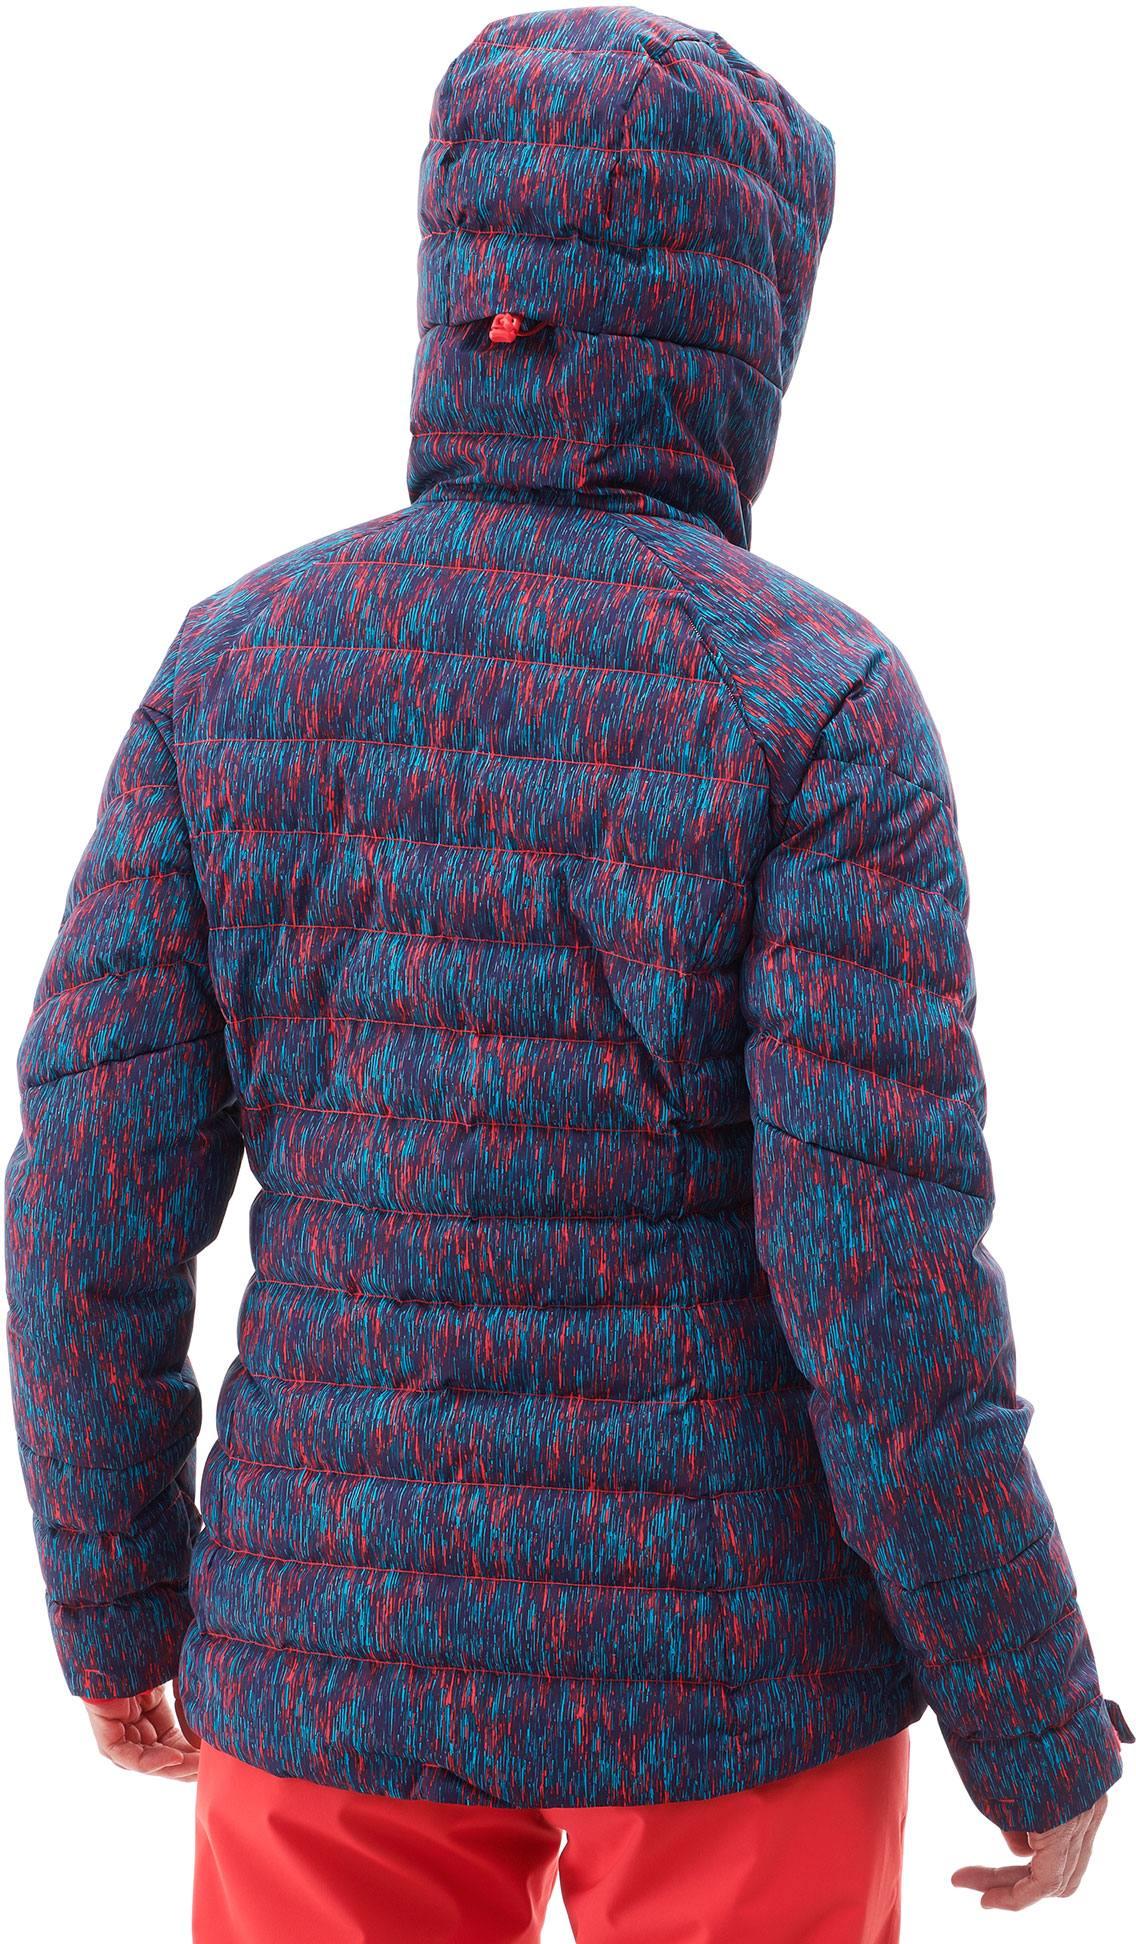 Millet Ld Robson Peak Jacket. Full image Full image ... 583a1560a